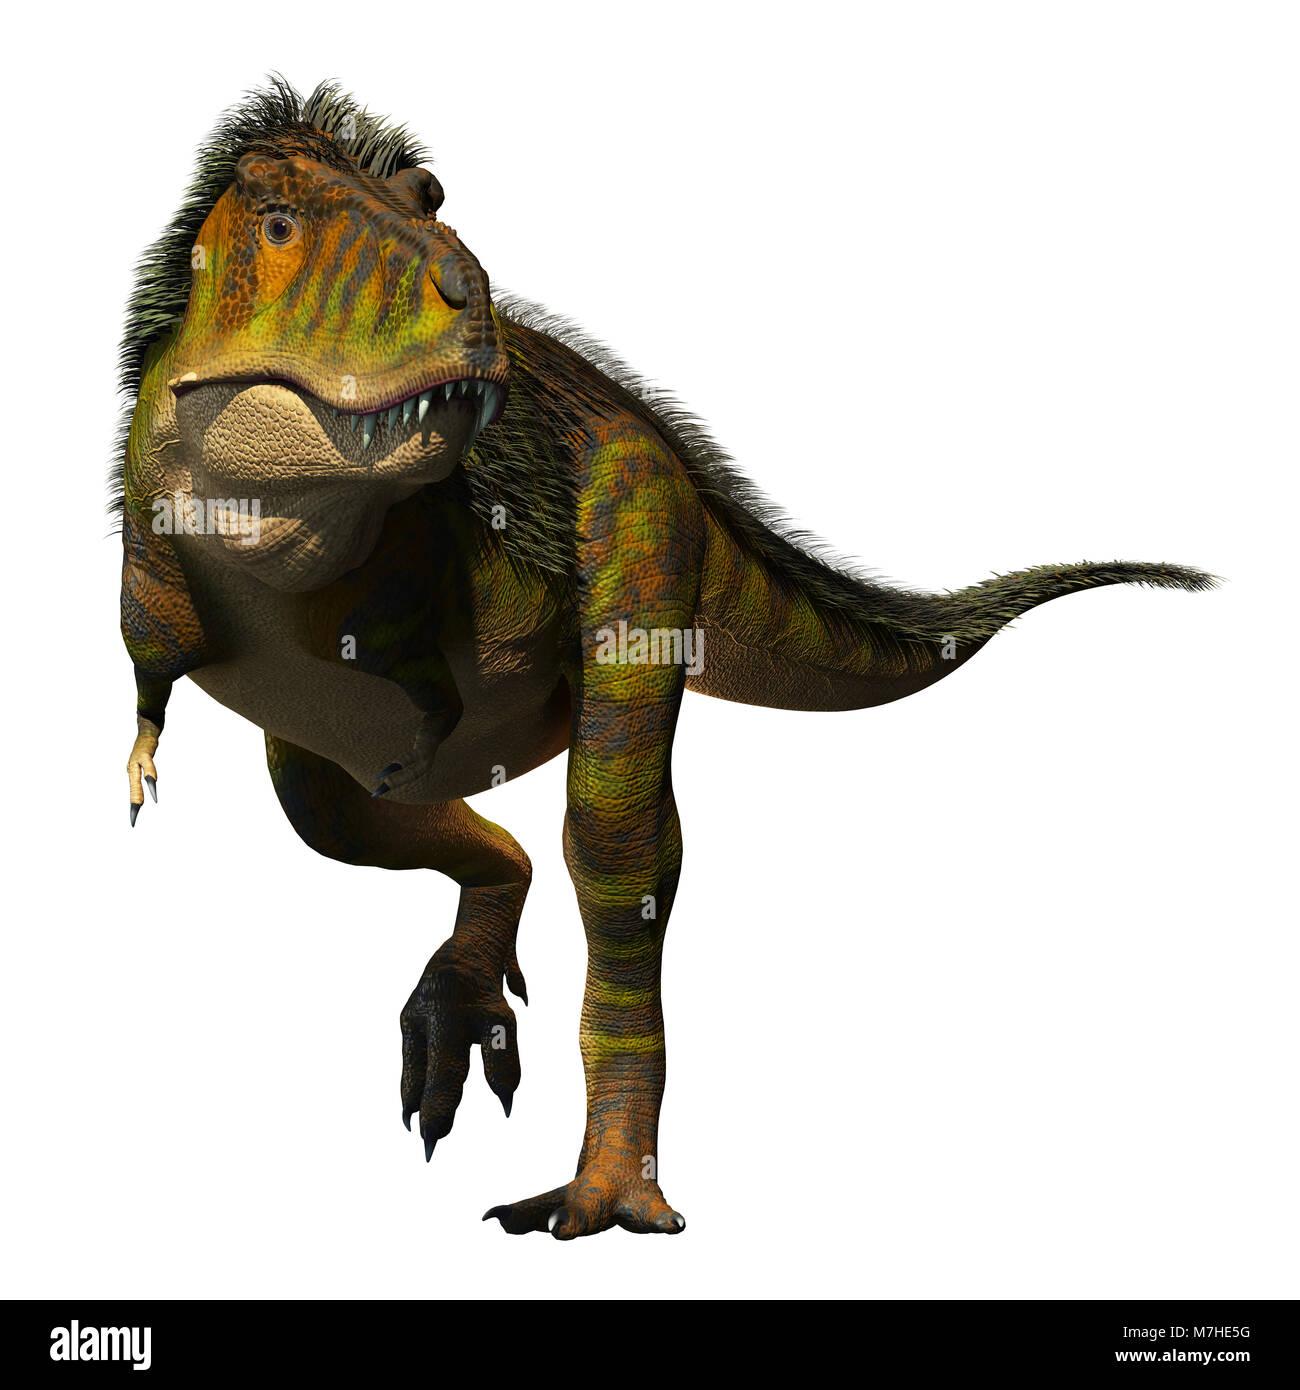 Tyrannosaurus Rex on the prowl. - Stock Image